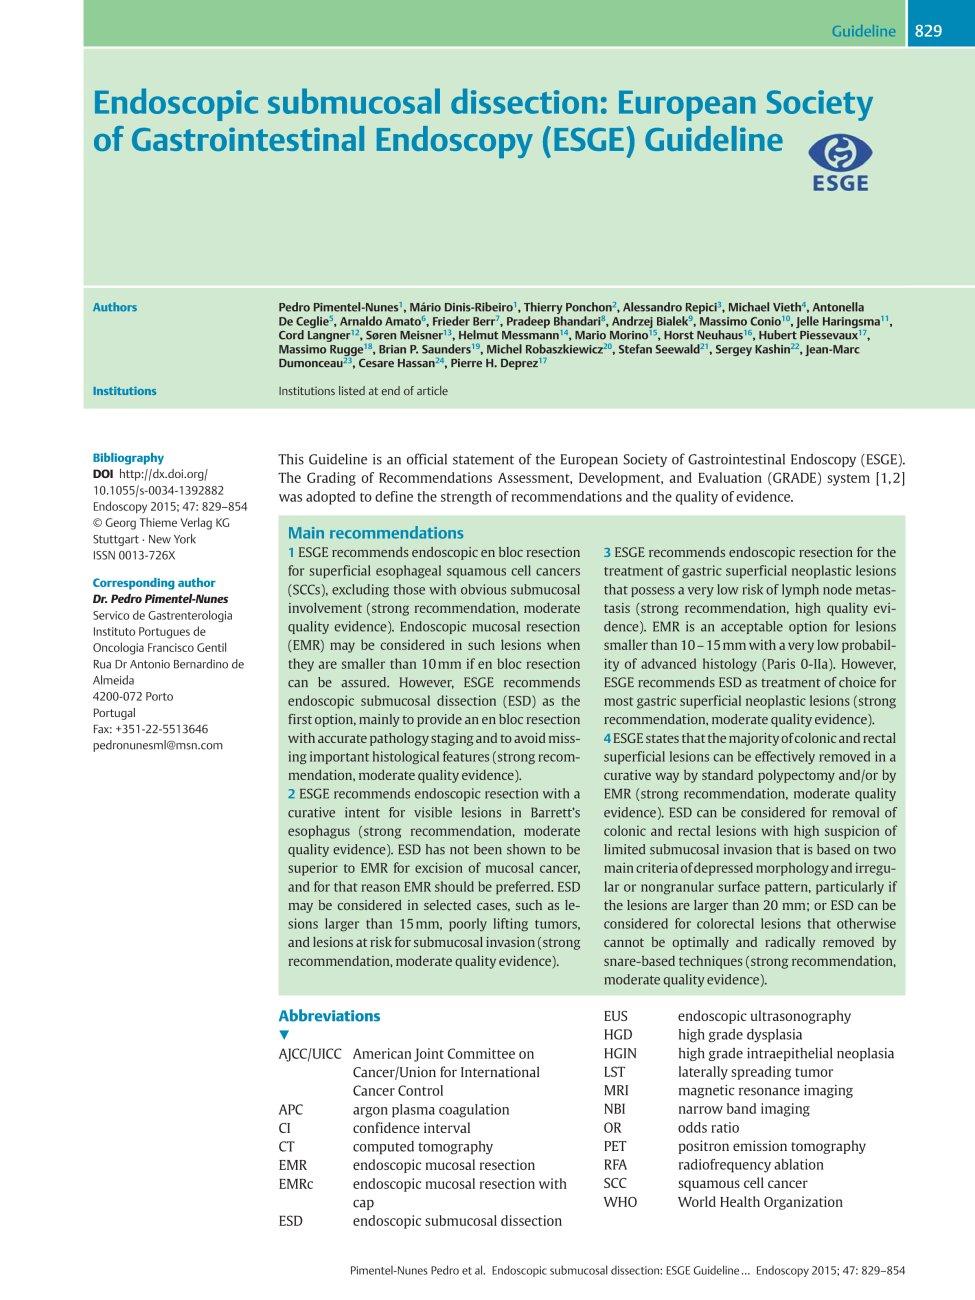 Endoscopy Department: Endoscopy / Abstract